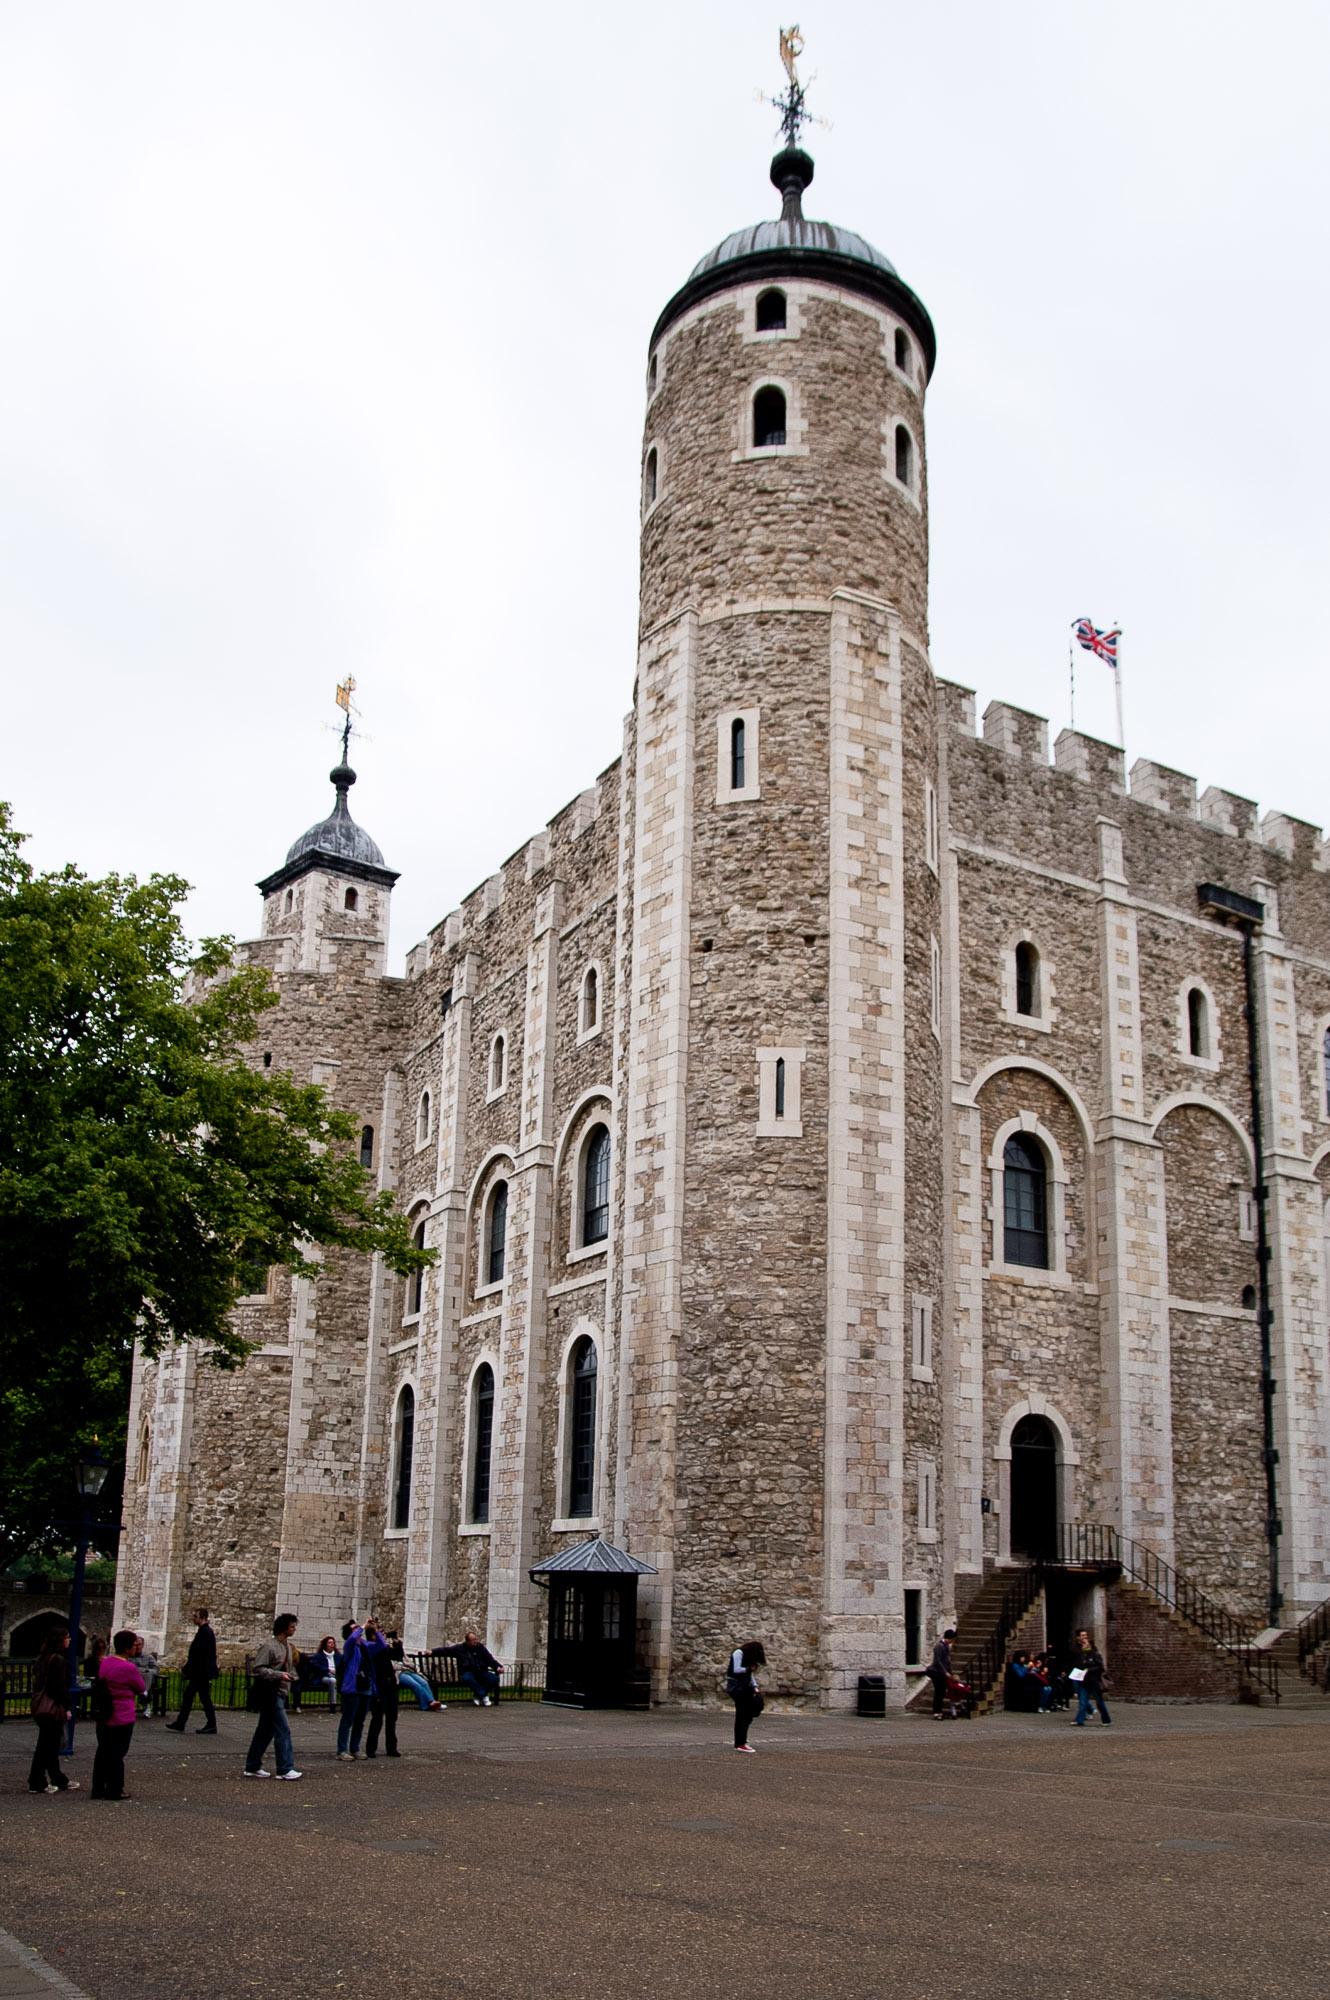 Tower III